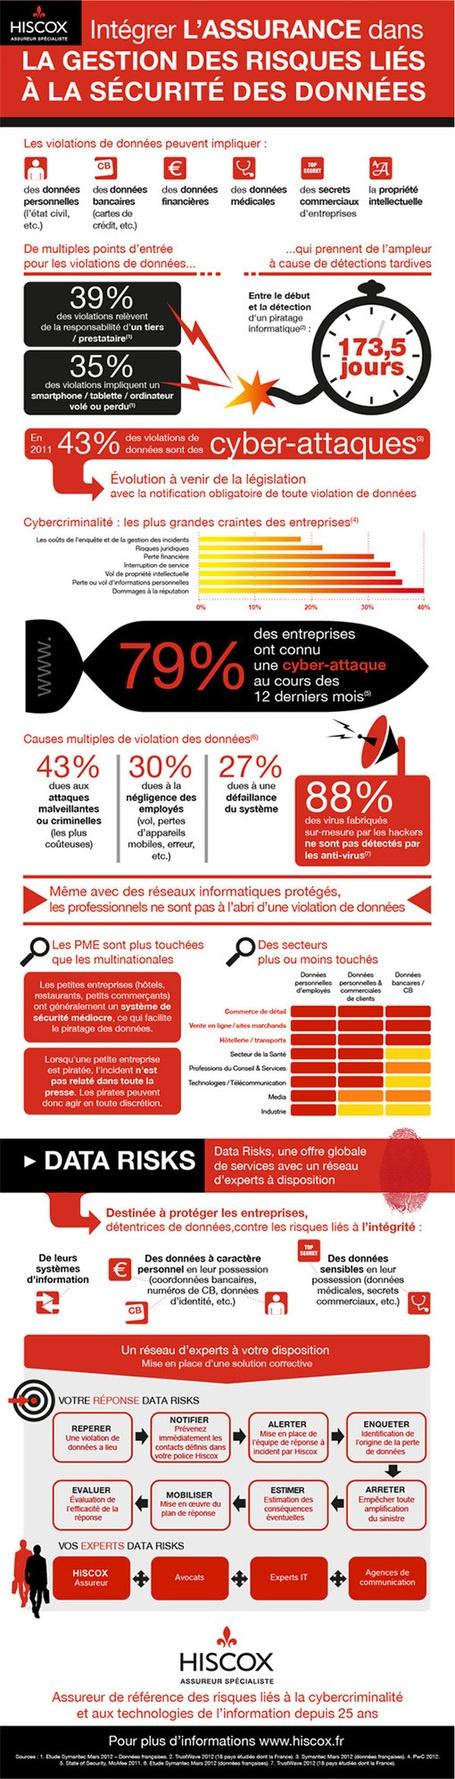 Infographie hiscox perte vol de donn es int grer l assurance dans la risk managementassurancevol